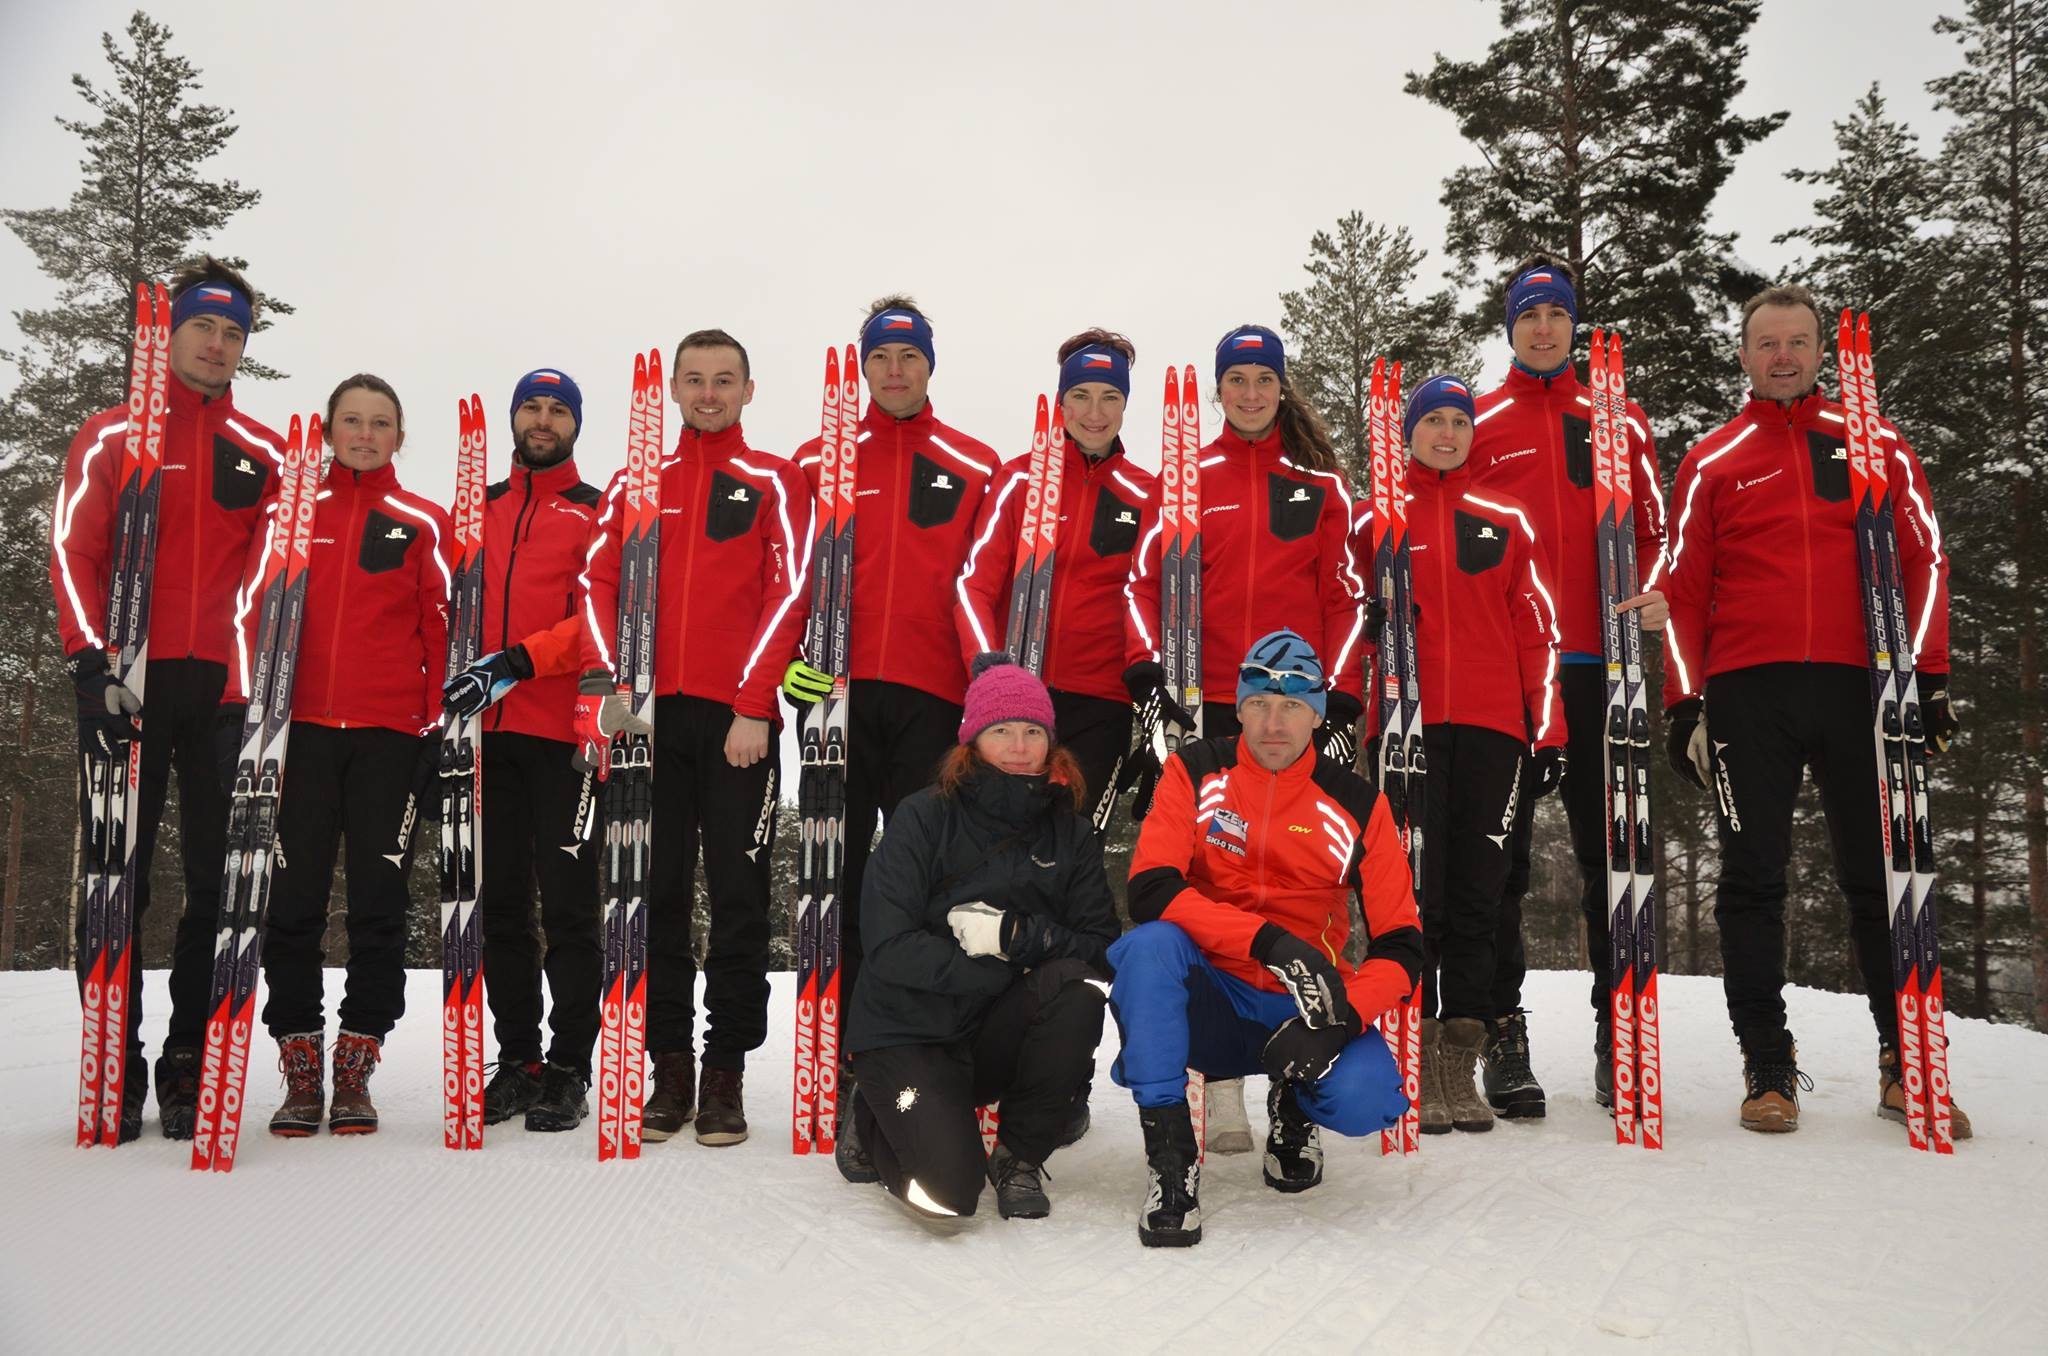 Header Image - Czech Ski-O Team